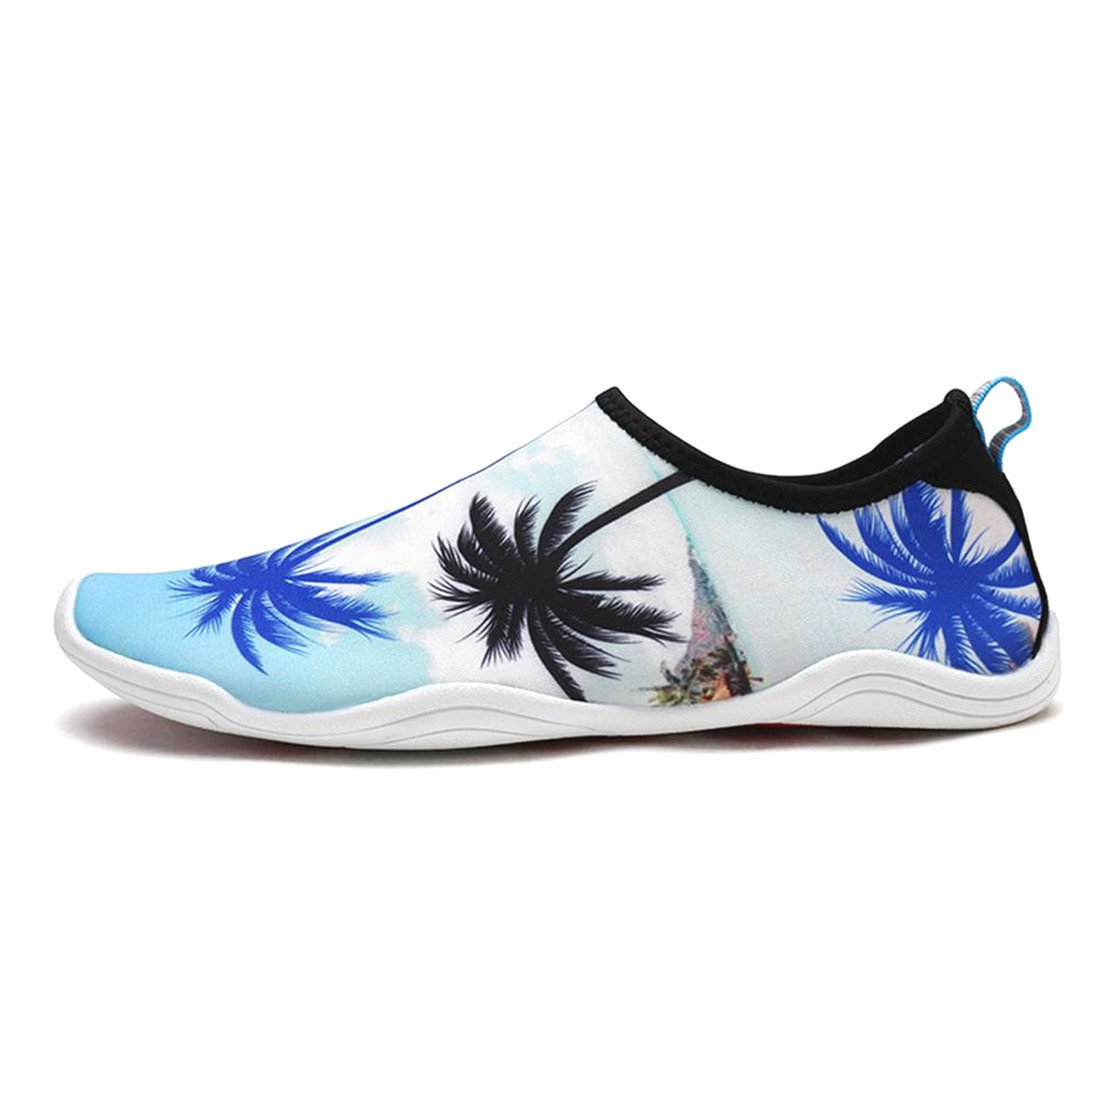 APTRO Womens and Mens Water Shoes Aqua Socks for Kayaking Hiking Rocky Beaches Palm Tree White US (W:8.5)-(Men:7.5)